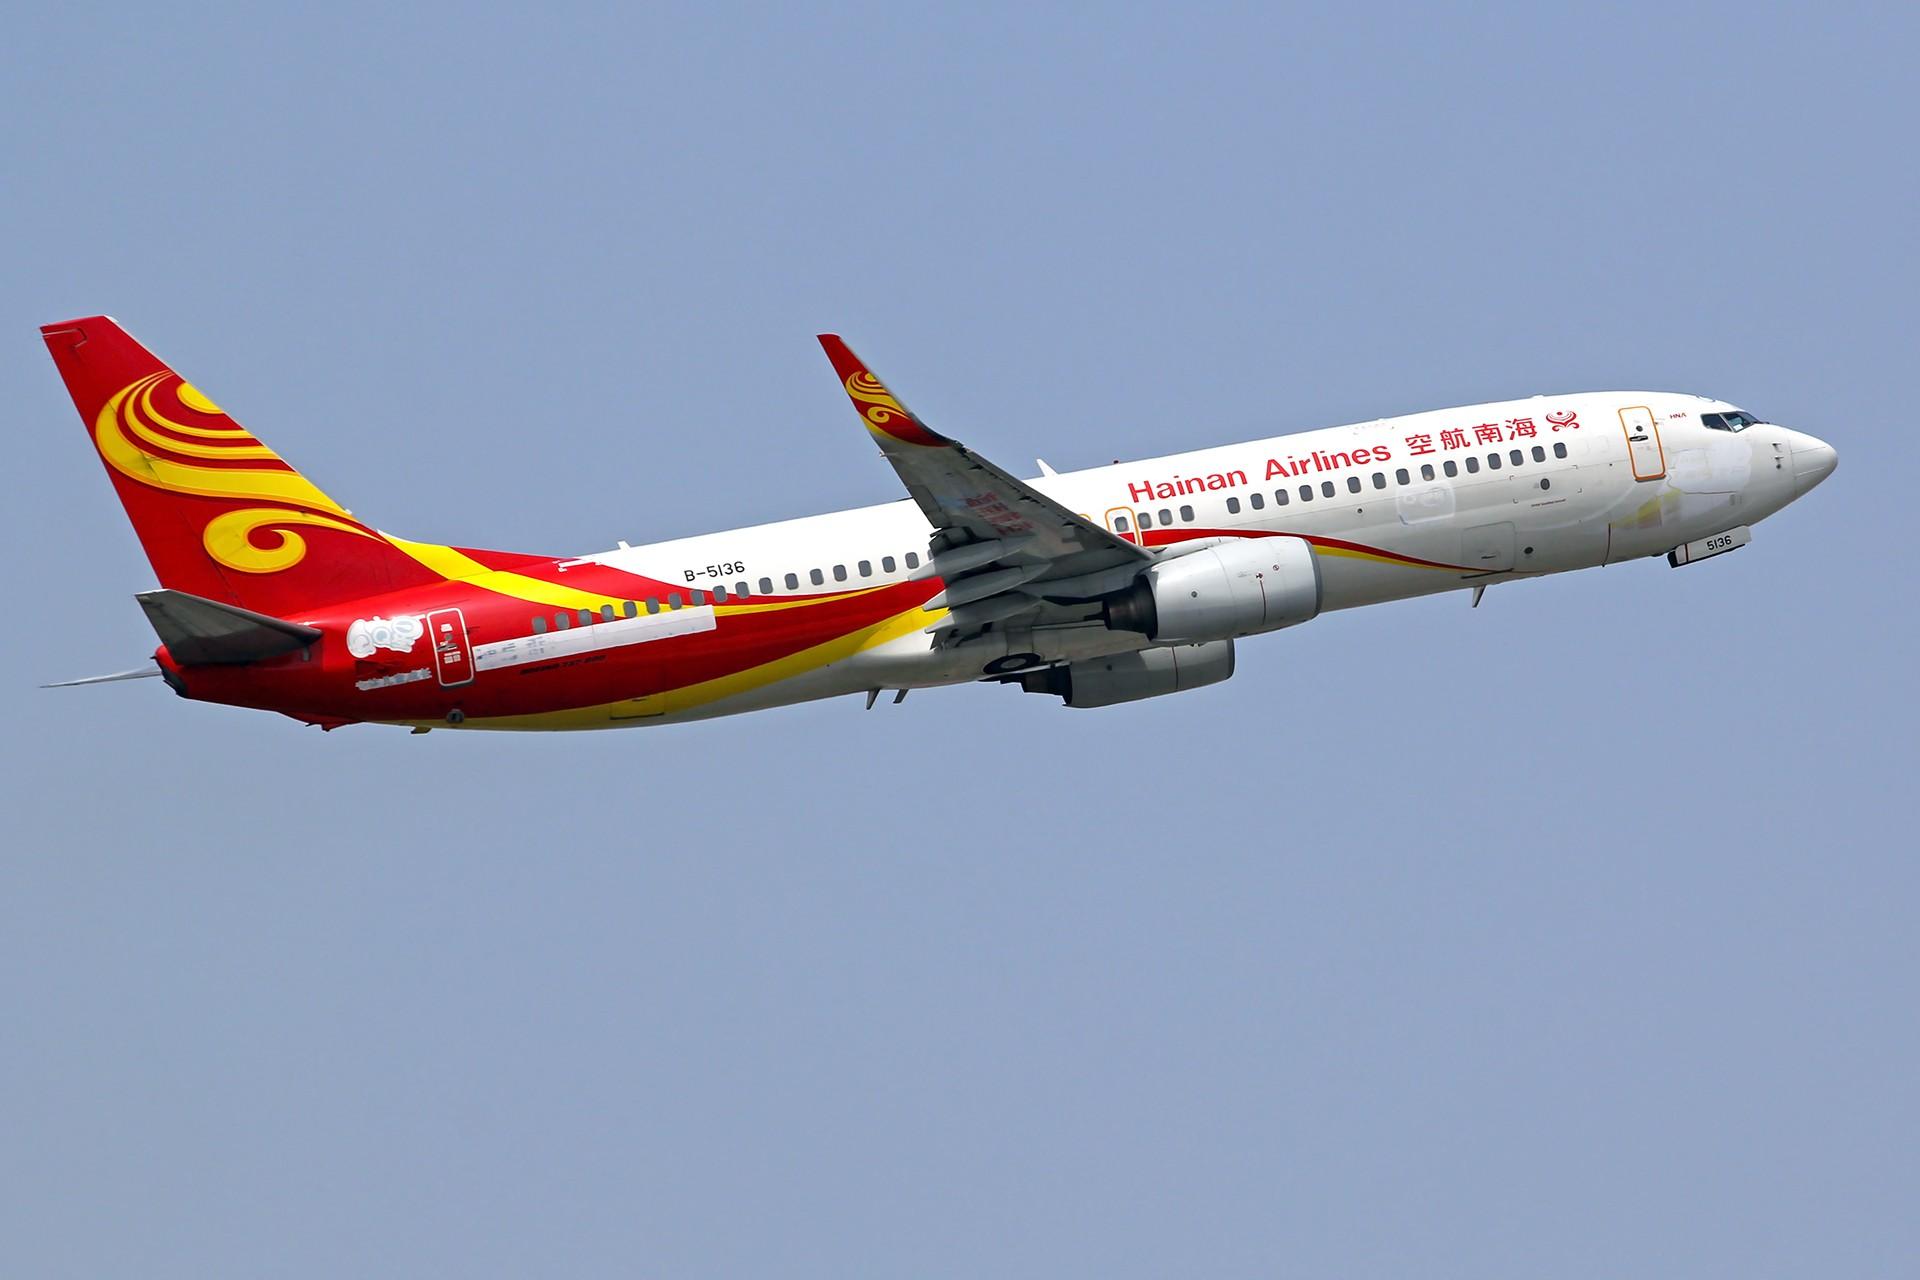 Re:[原创][DLC]雨过天晴,春意盎然…….. BOEING 737-800 B-5136 中国大连周水子国际机场